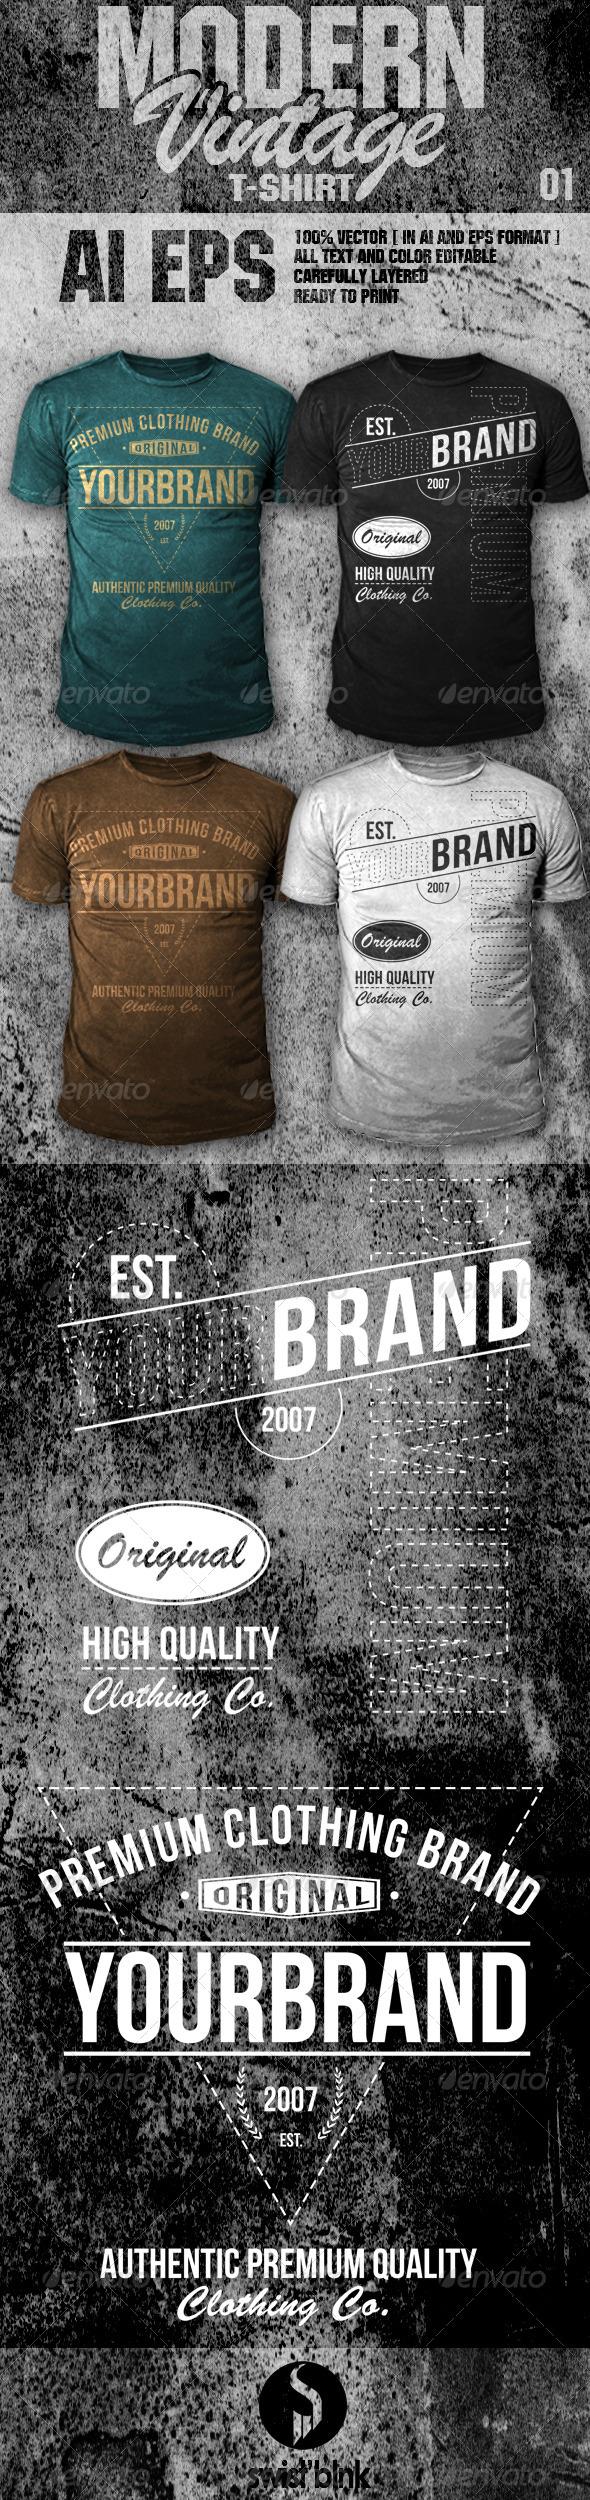 GraphicRiver Modern Vintage T-Shirt 01 6485018